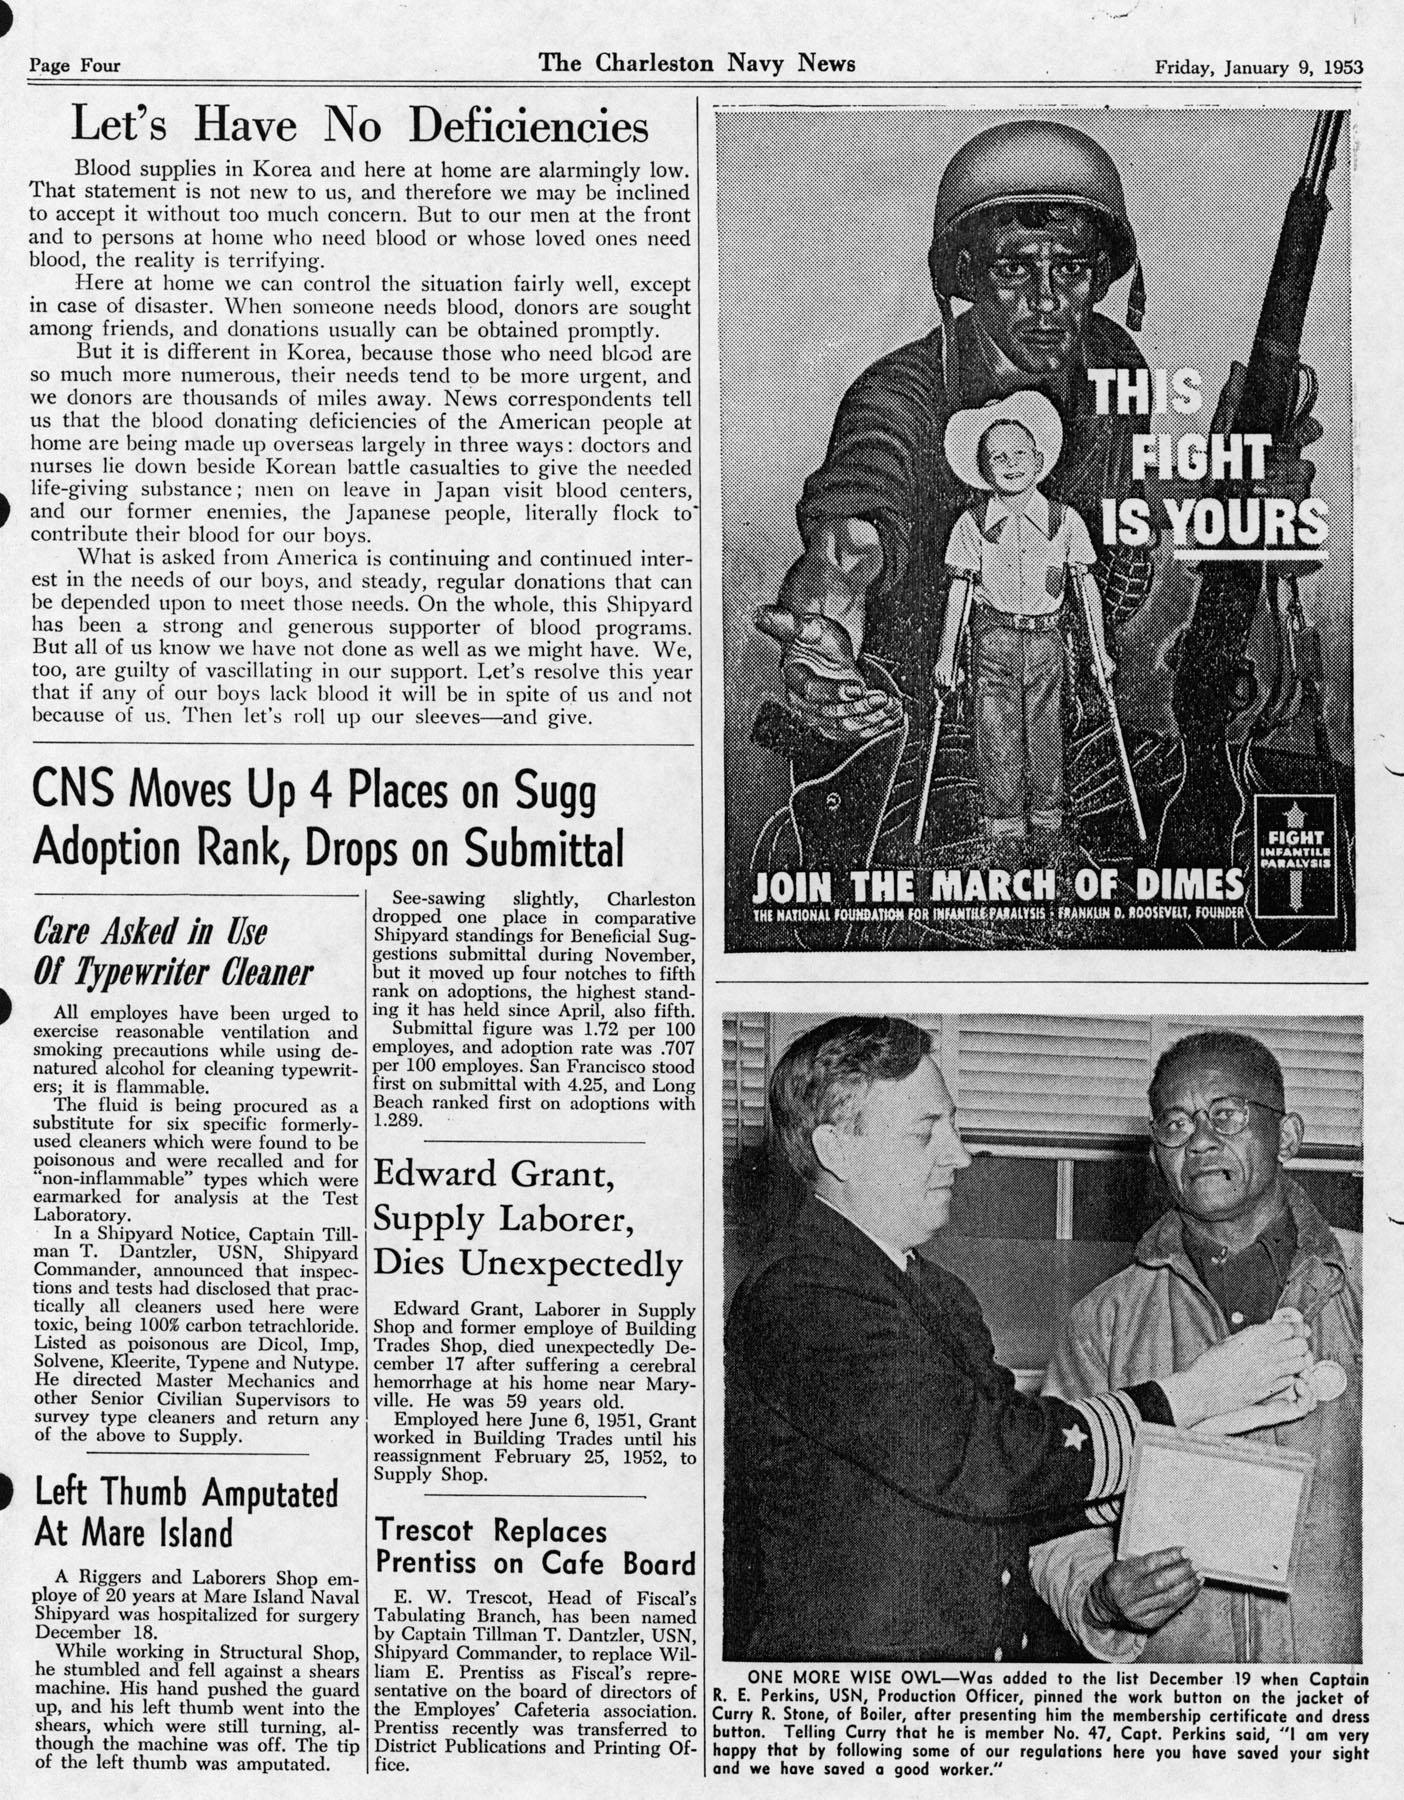 The Charleston Navy News, Volume 11, Edition 12, page iv